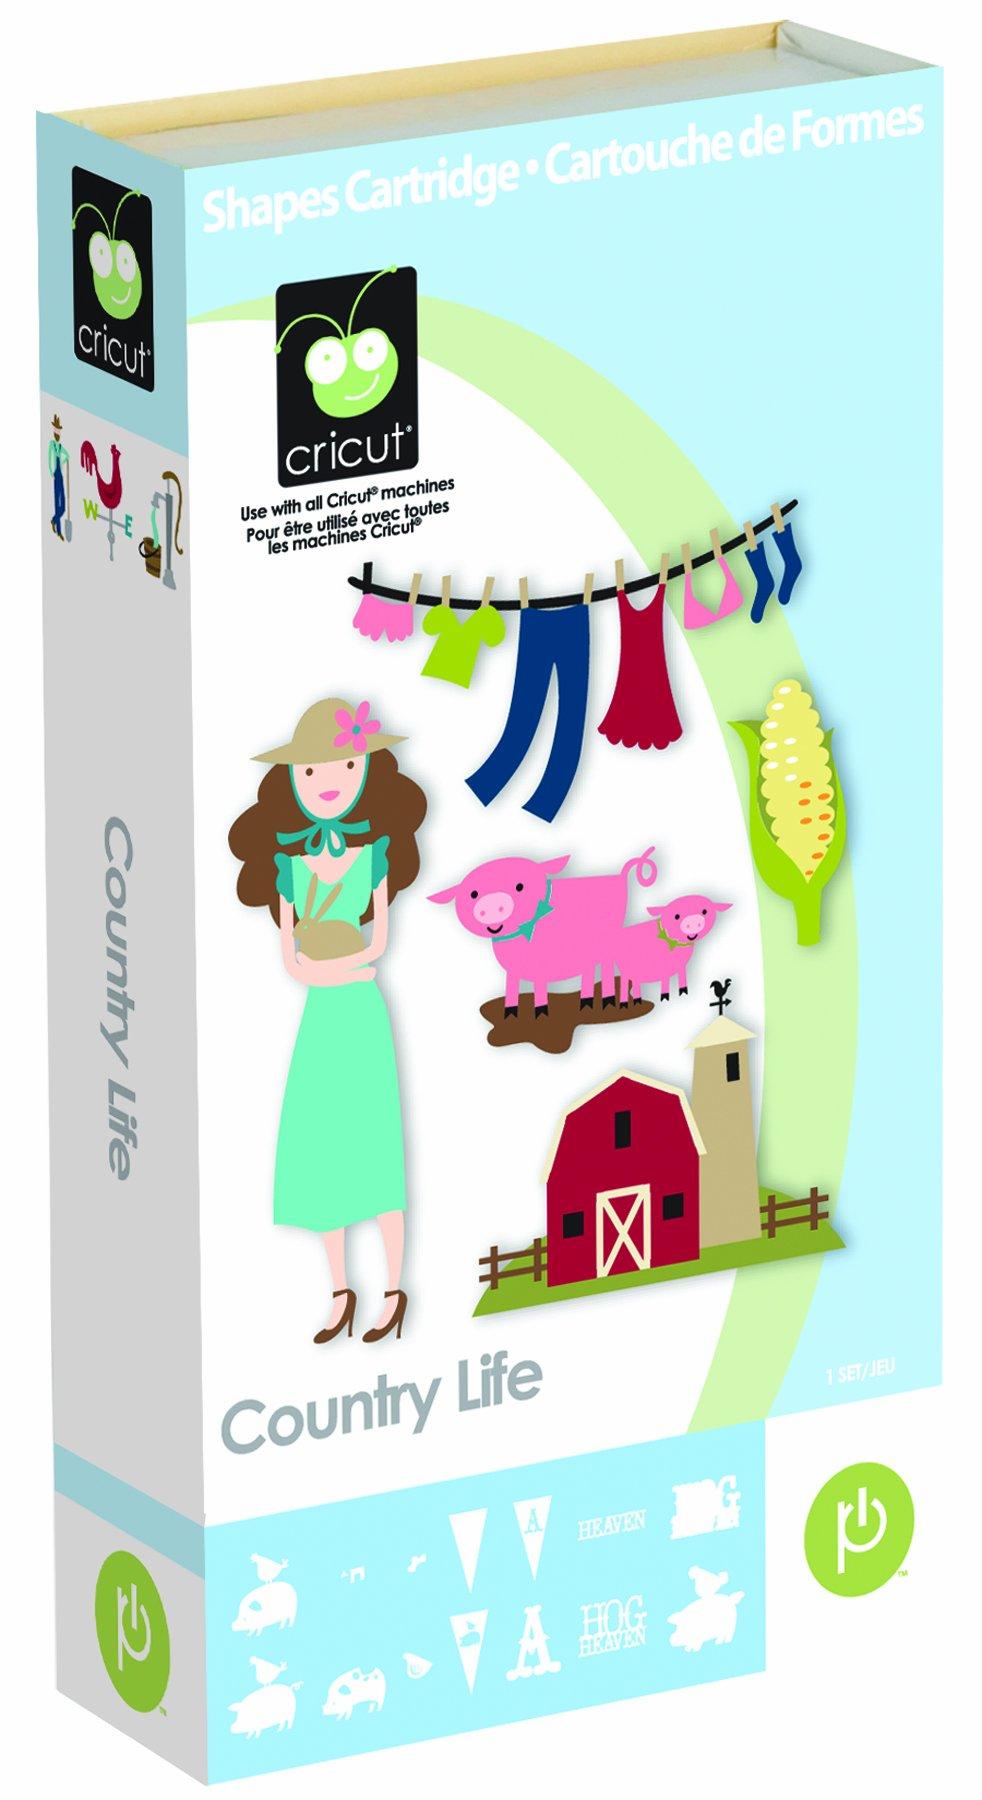 Cricut Country Life Cartridge product image